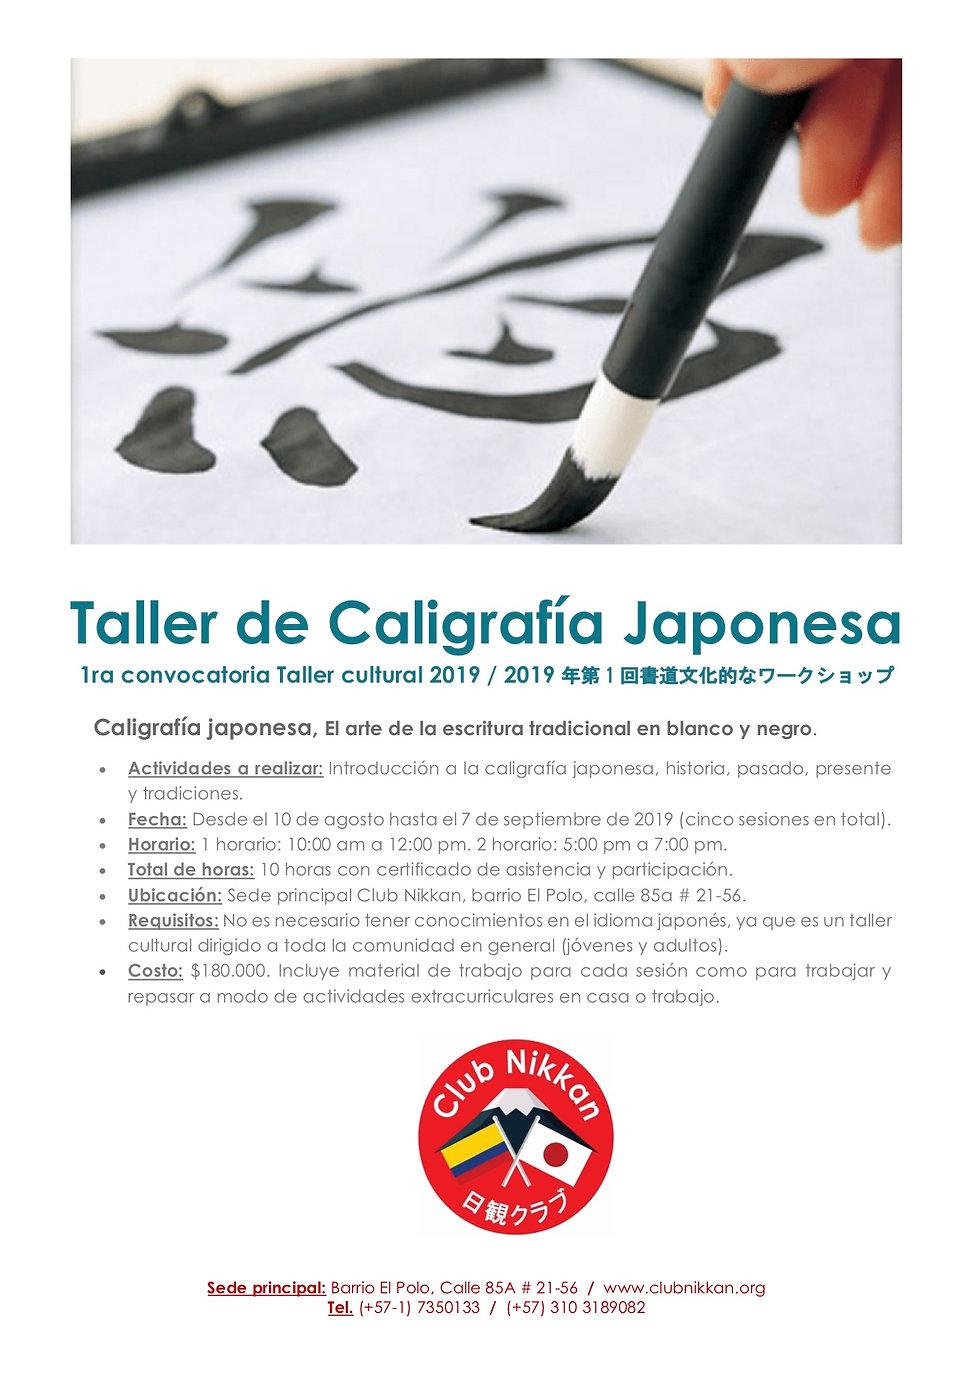 Taller_de_Caligrafía_Japonesa_2019_IIS.j